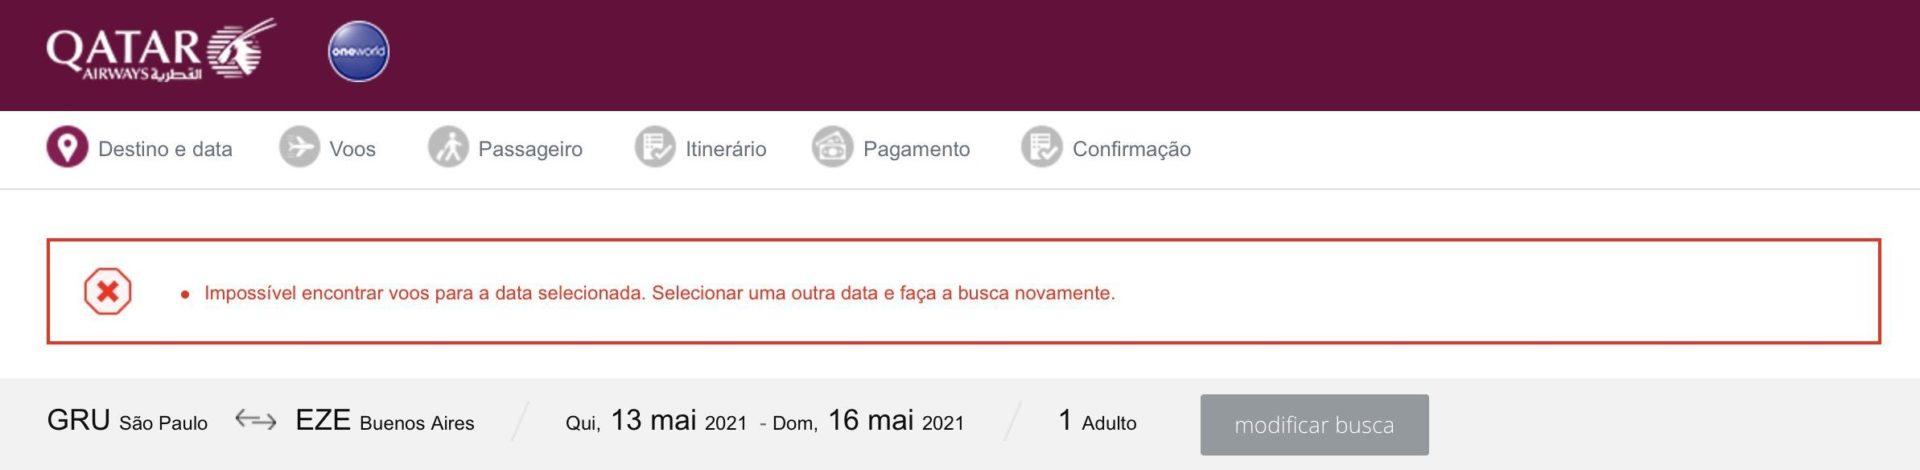 Qatar cancelamento Buenos Aires